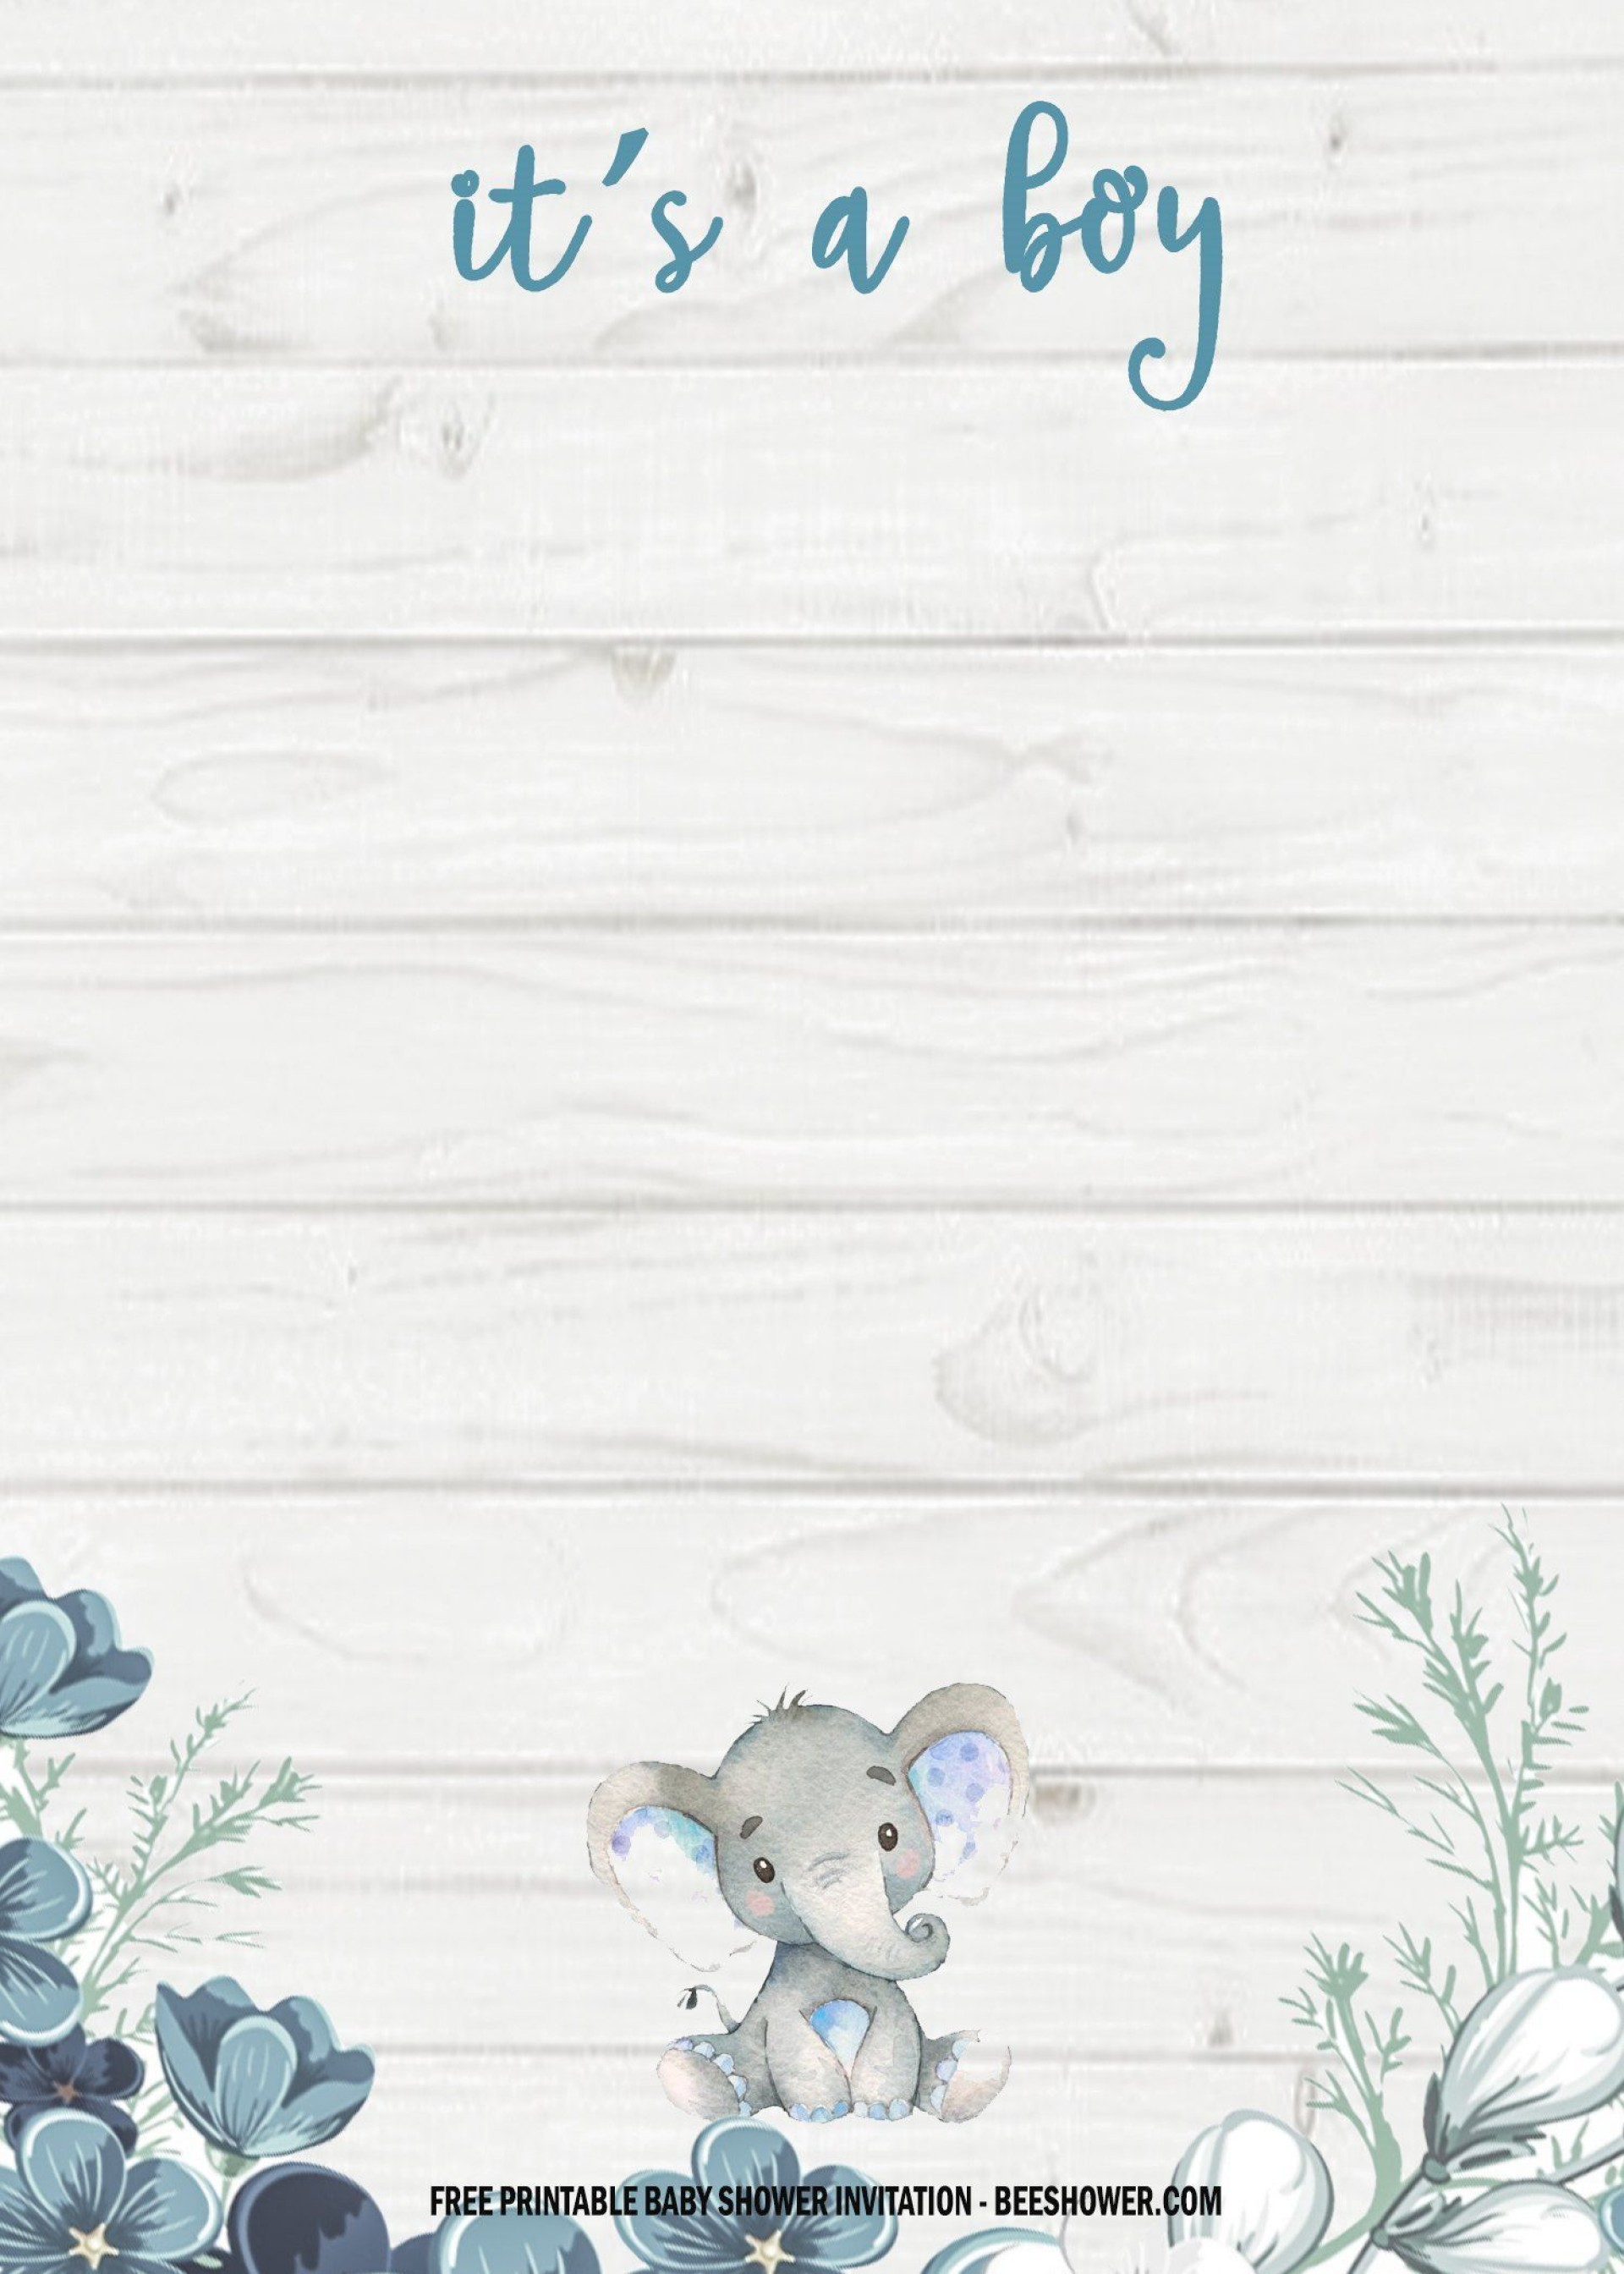 004 Amazing Elephant Baby Shower Invitation Template Concept  Templates Free Pdf Boy1920